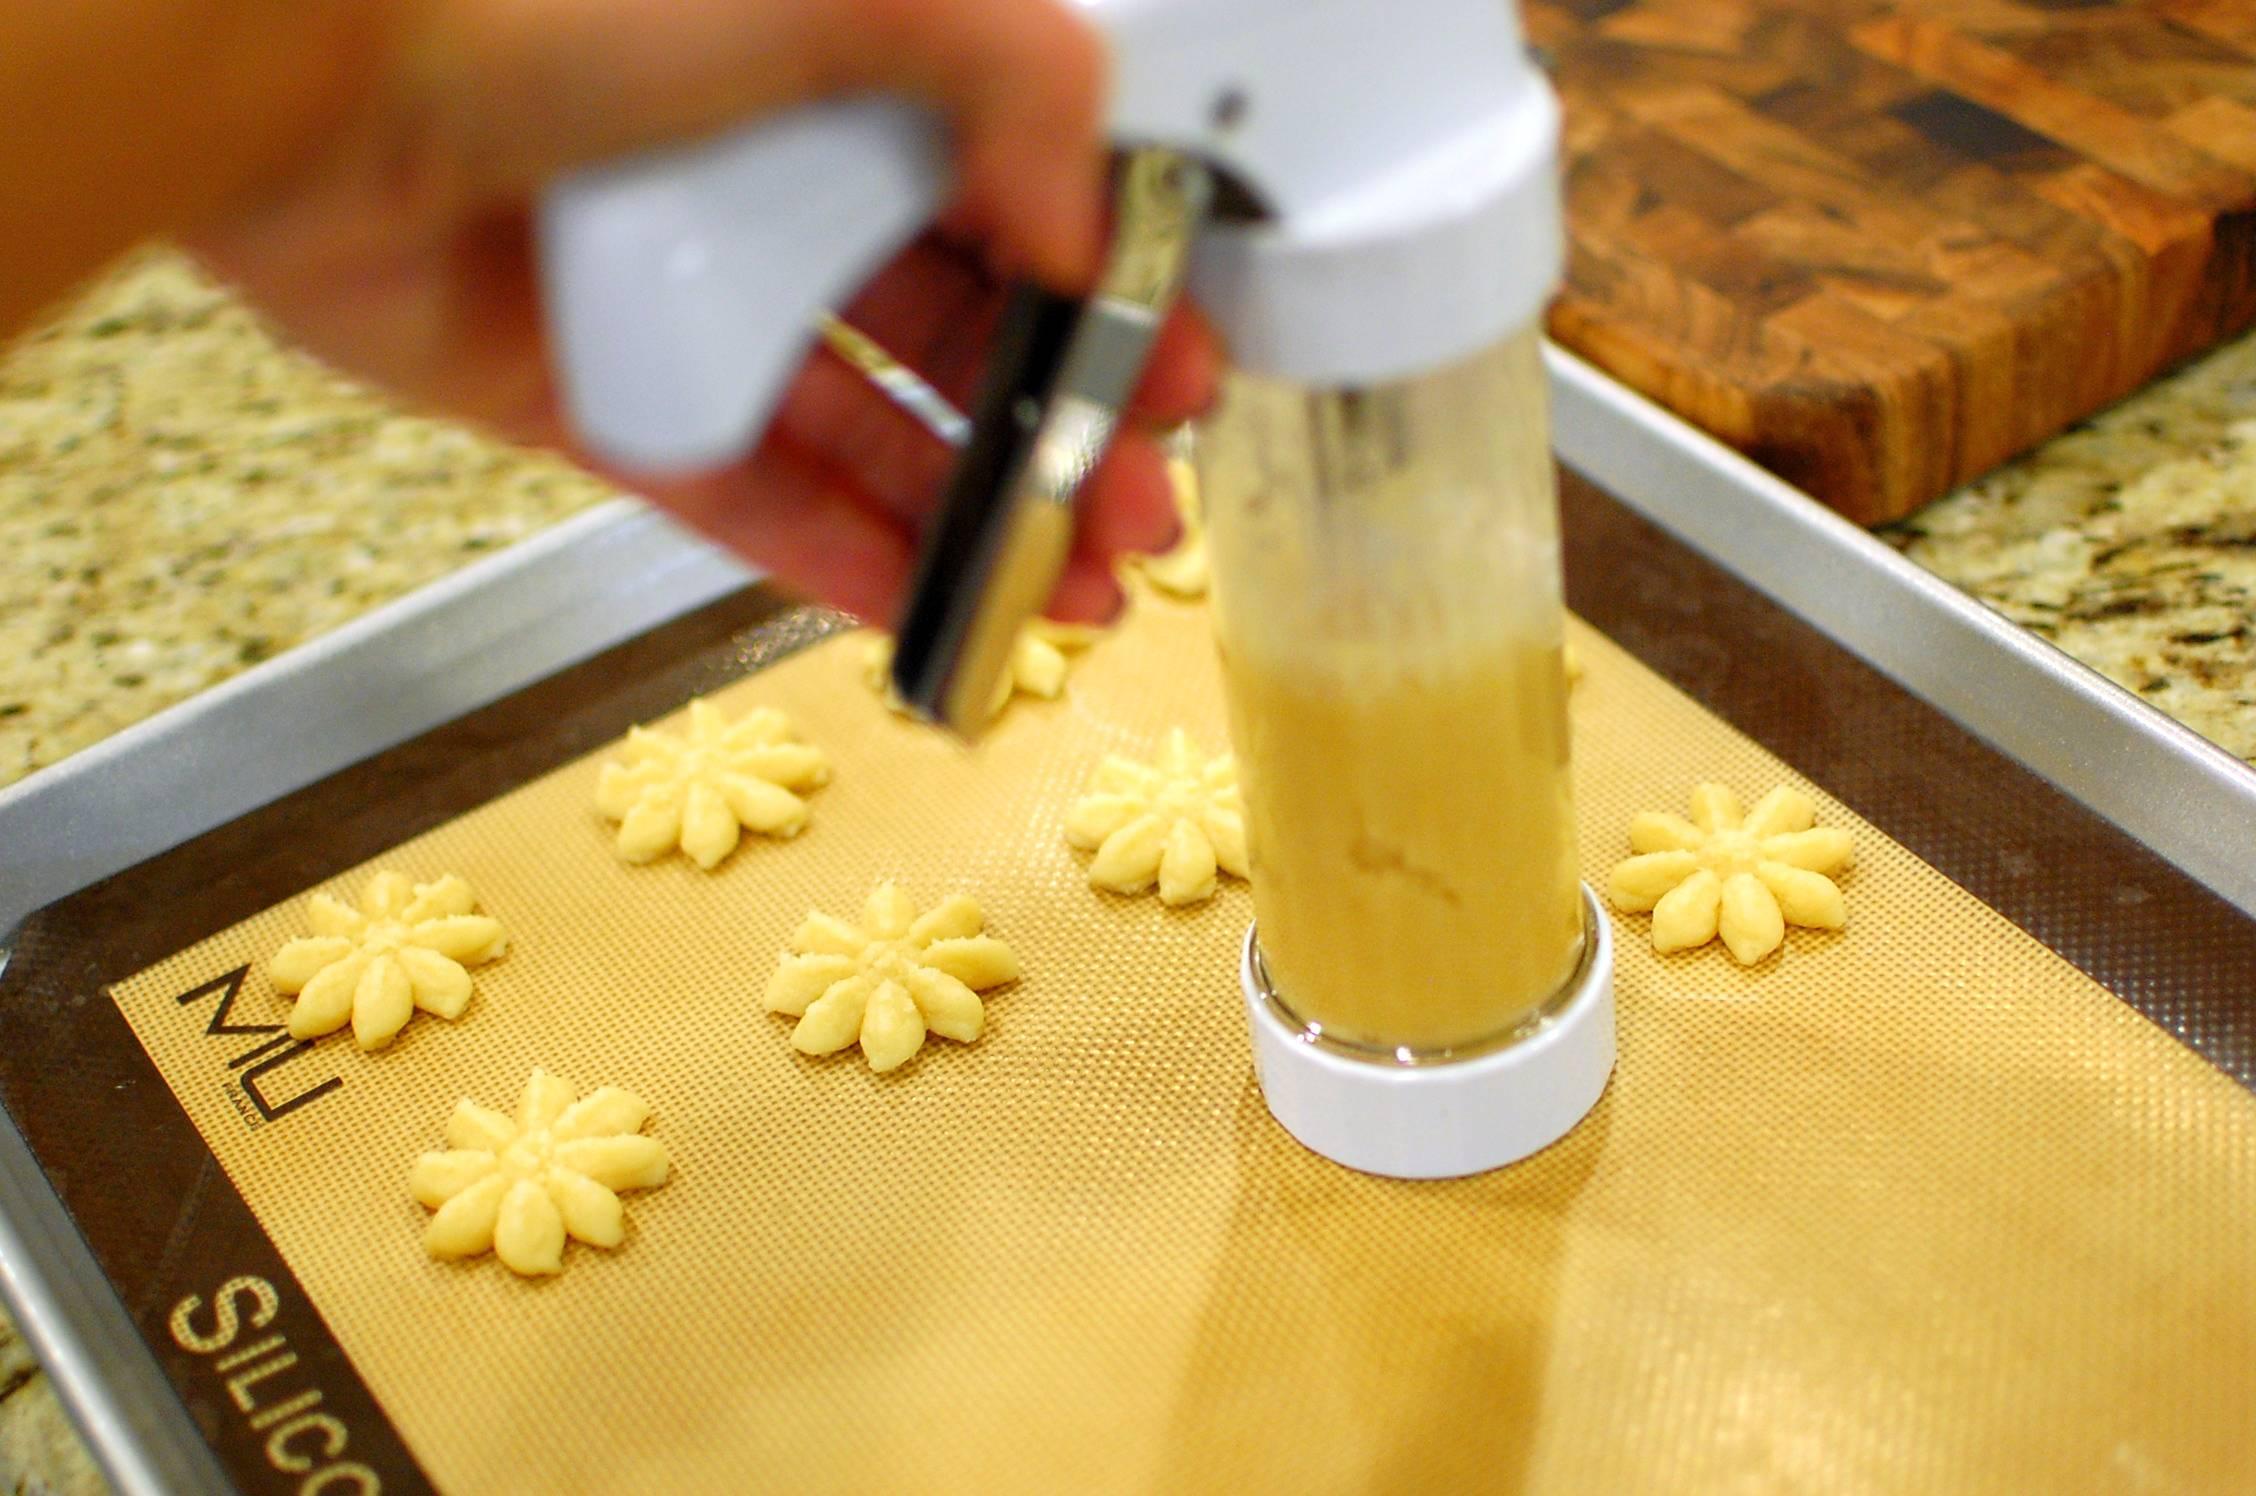 how to make press cookies